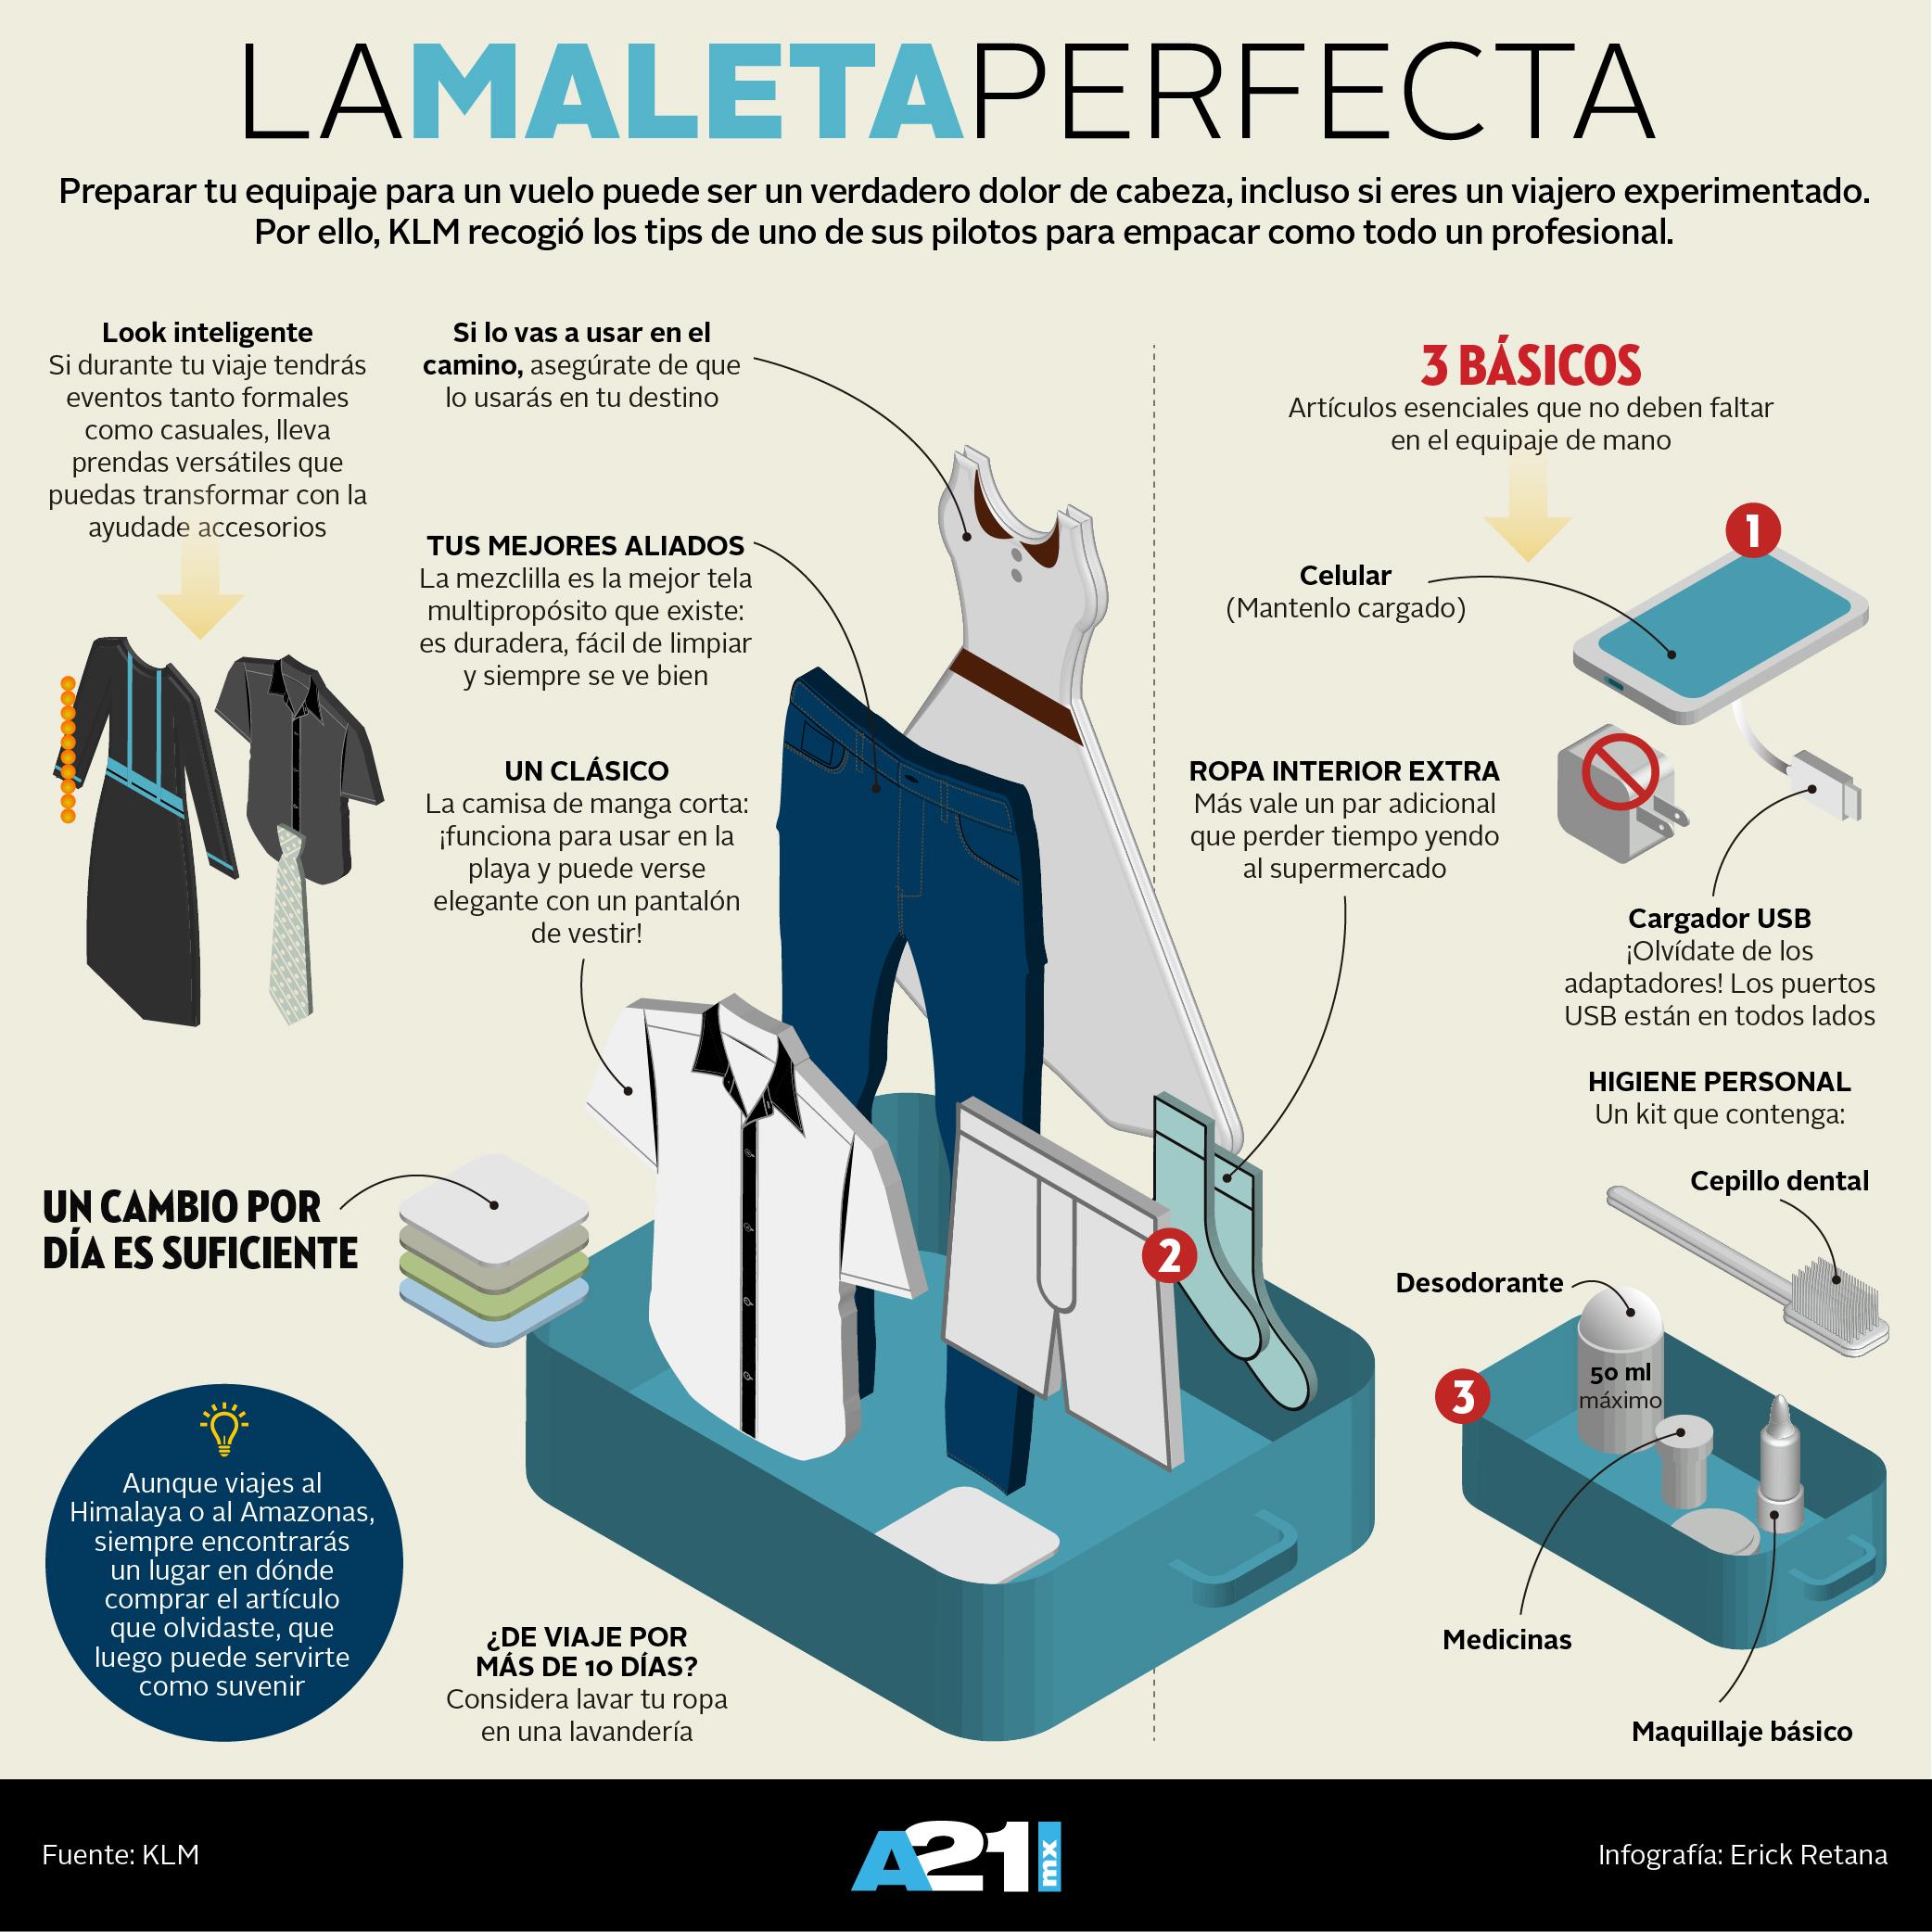 maleta_perfecta